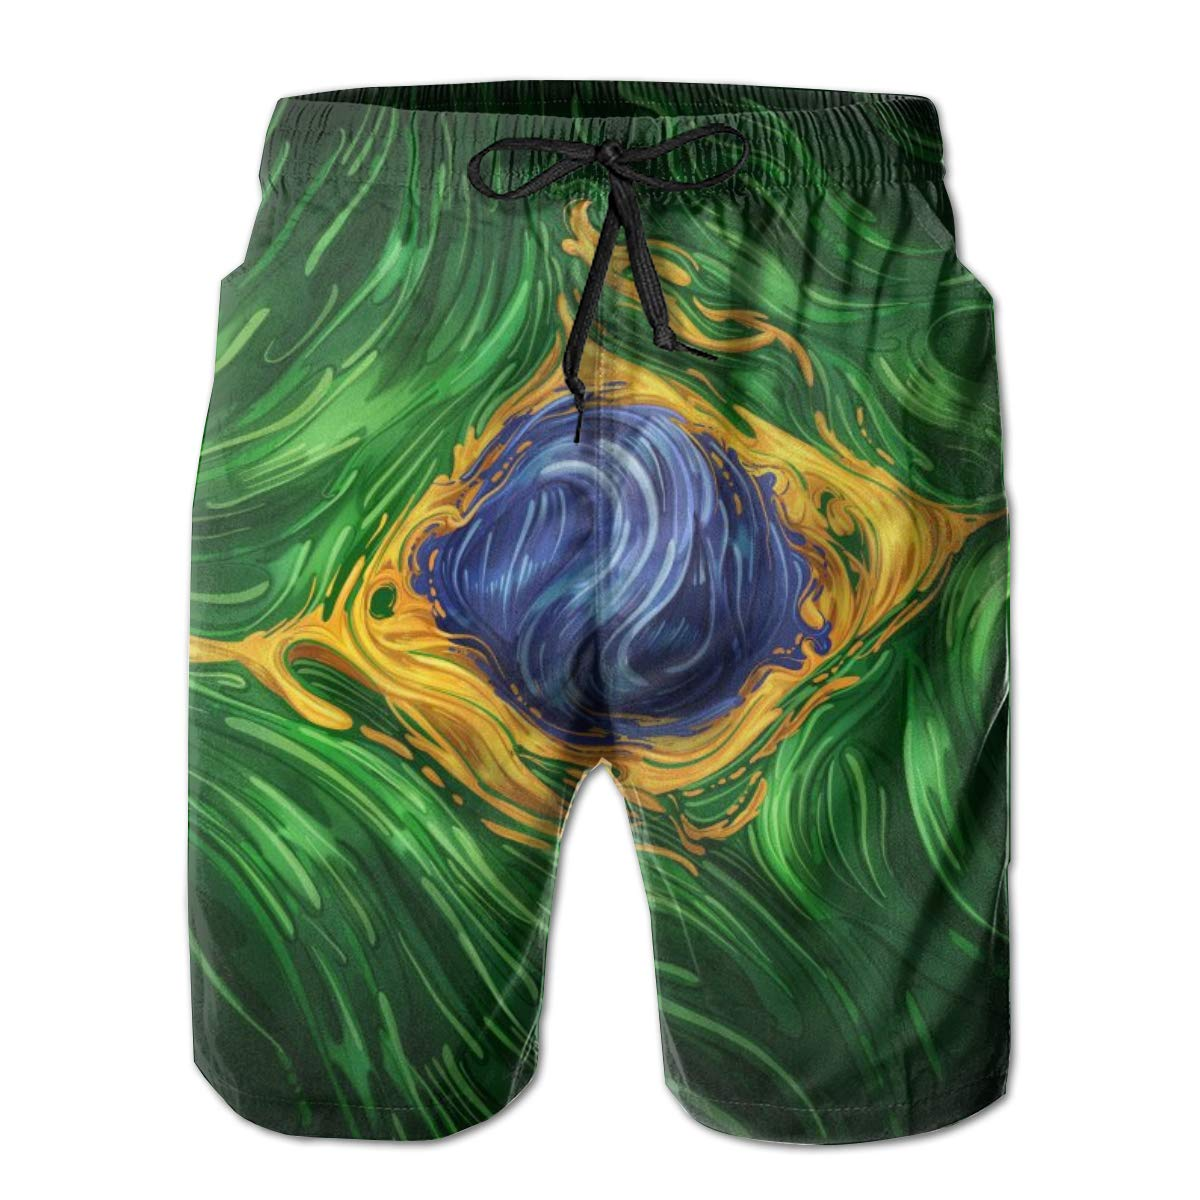 INWANZI Mens Beach Shorts Swim Trunks Quick Dry Bathing Suit Brazil Flag Psychedelic